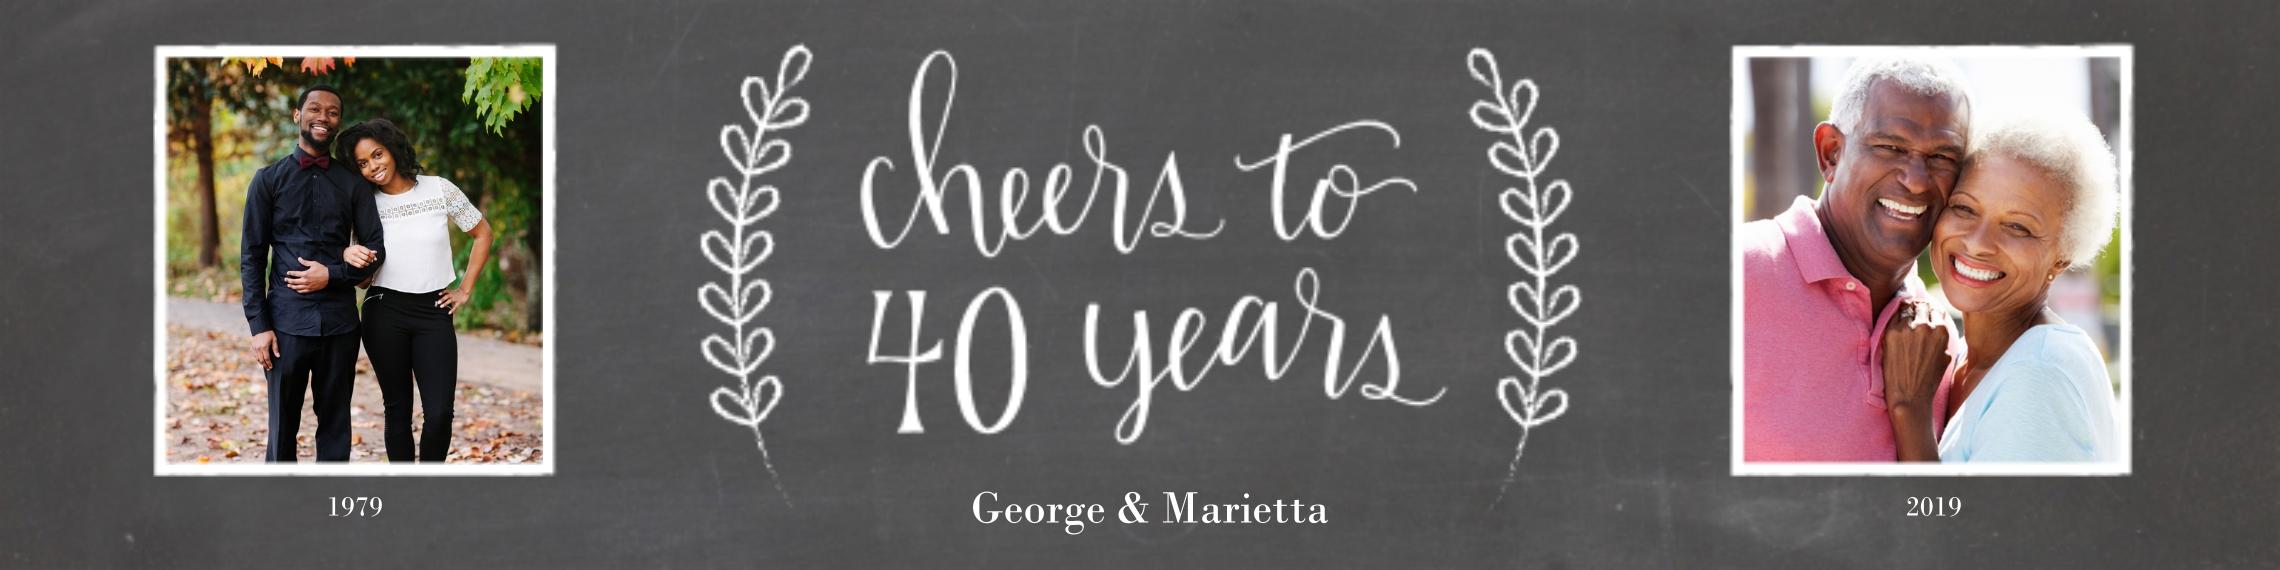 Anniversary 2x8 Adhesive Banner, Home Décor -Chalkboard Anniversary